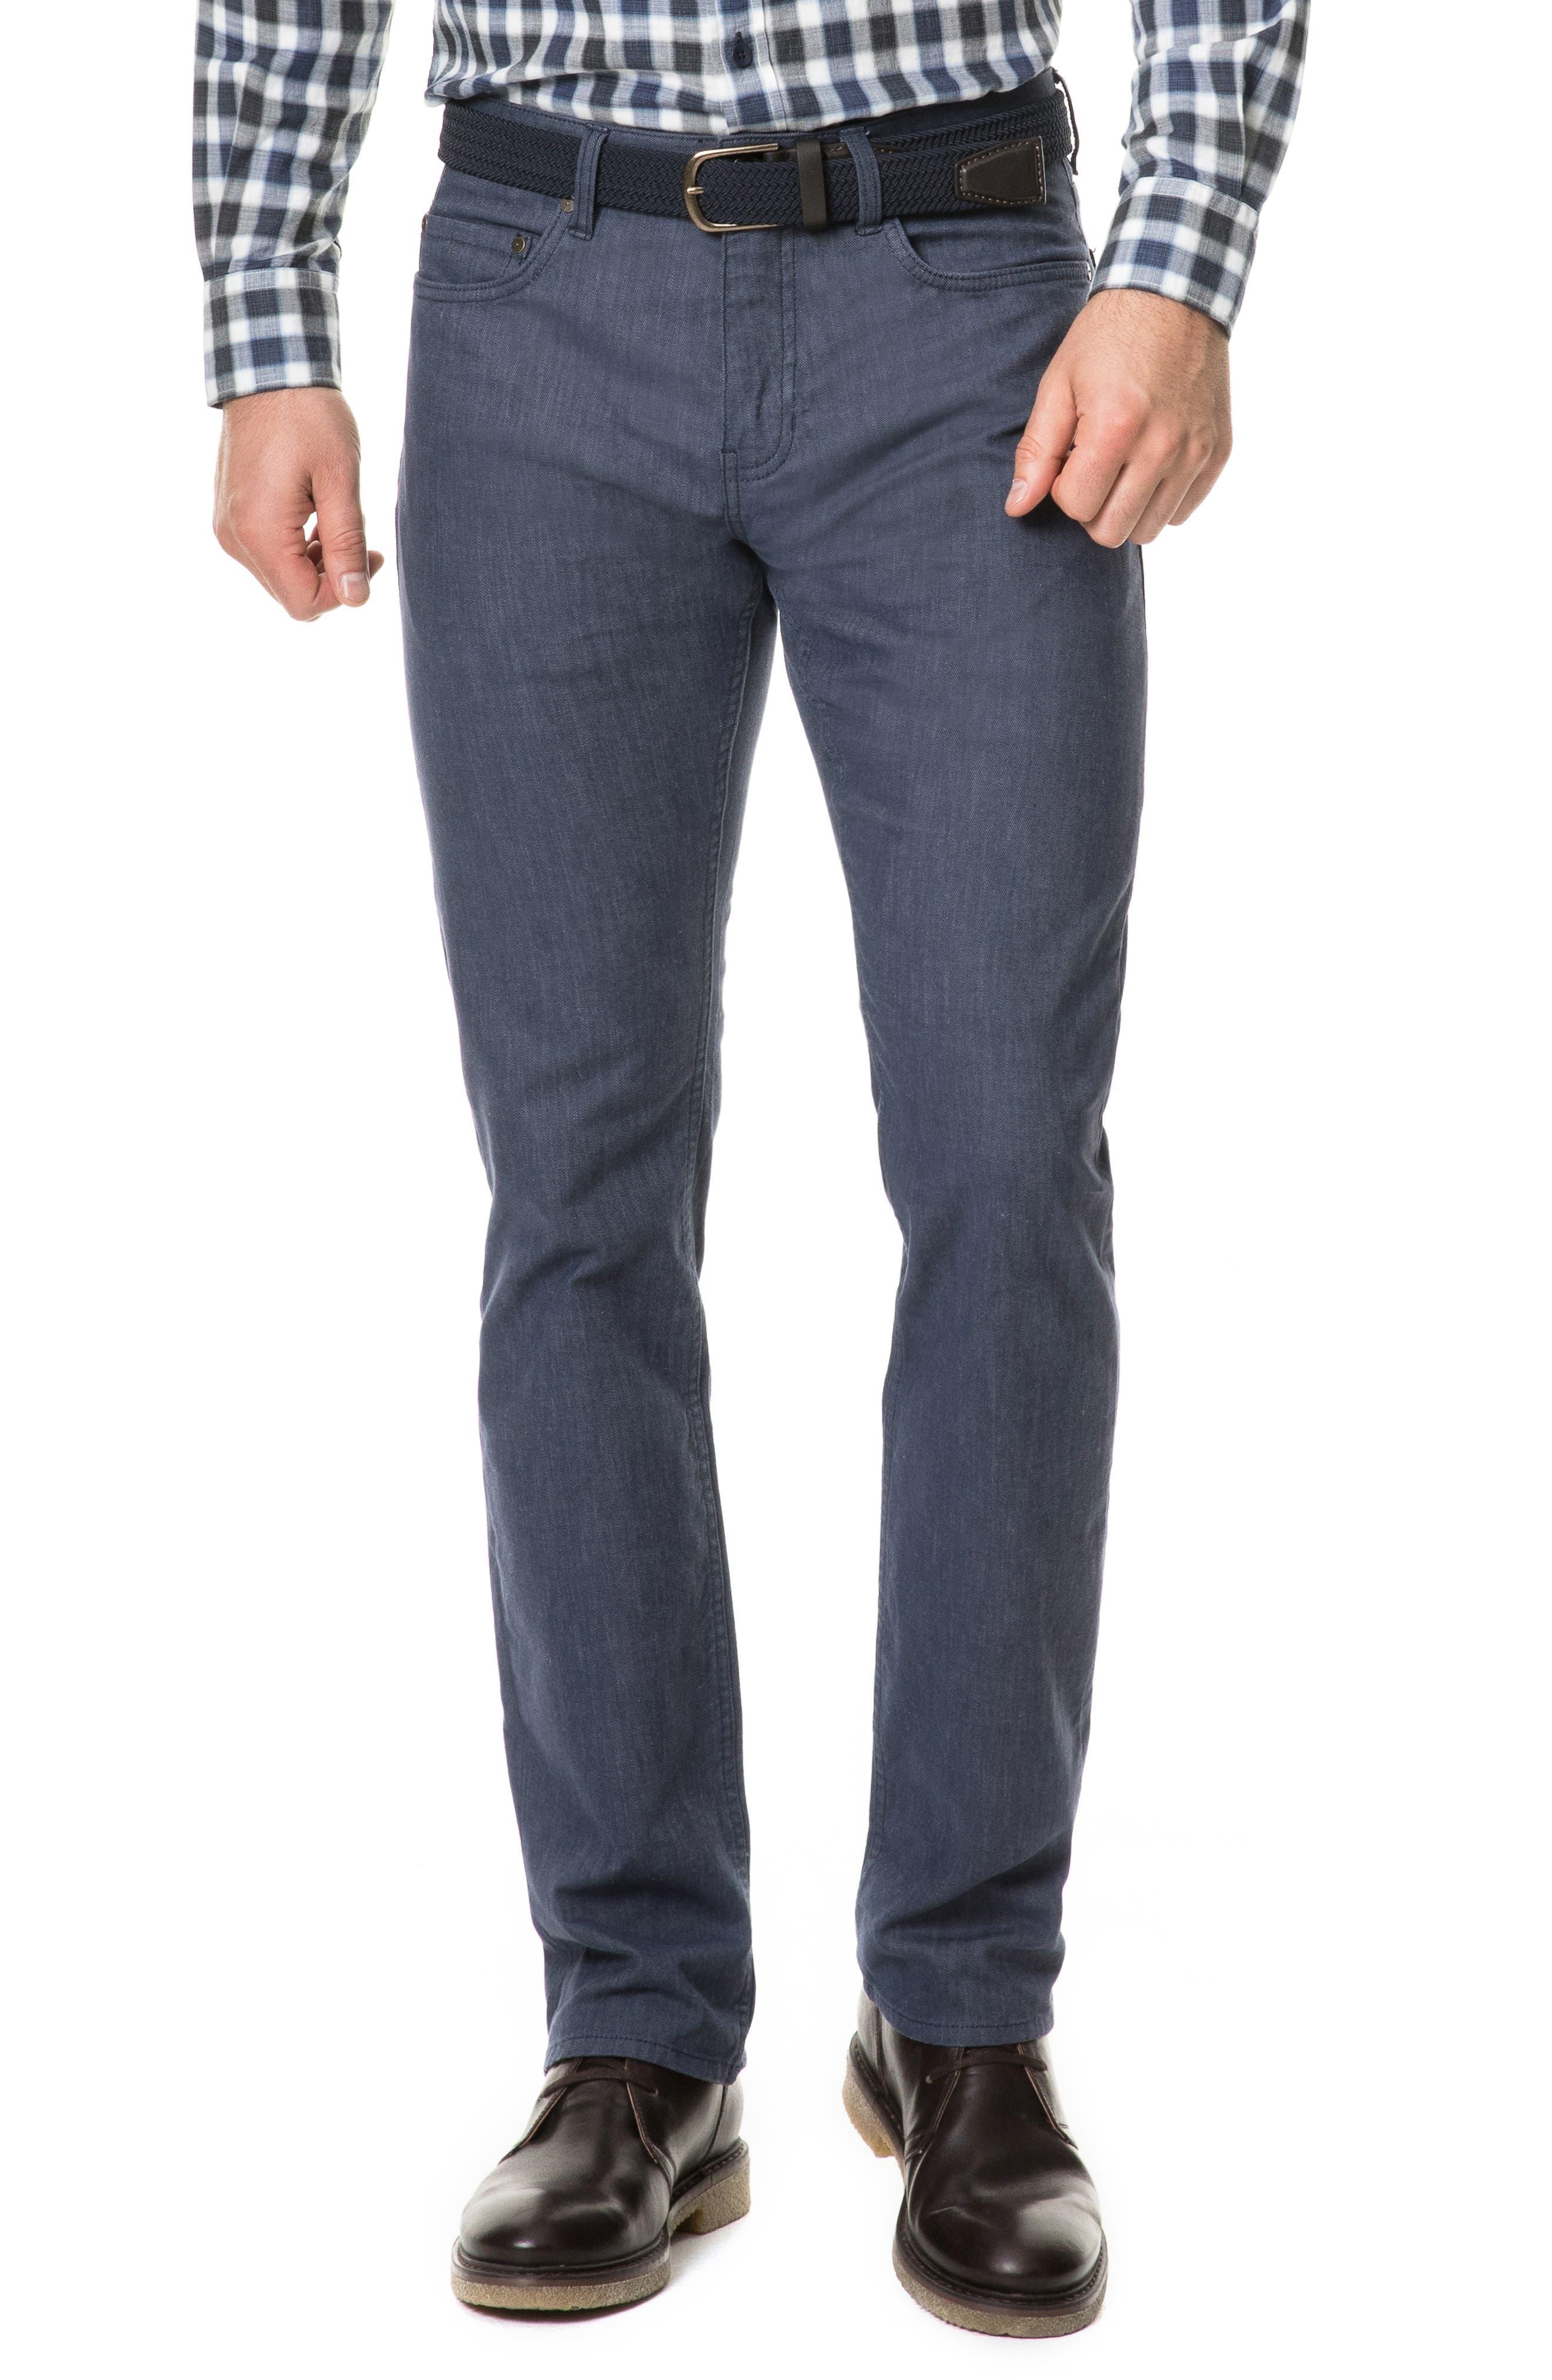 Amisfield Regular Fit Jeans,                             Main thumbnail 1, color,                             DUSK